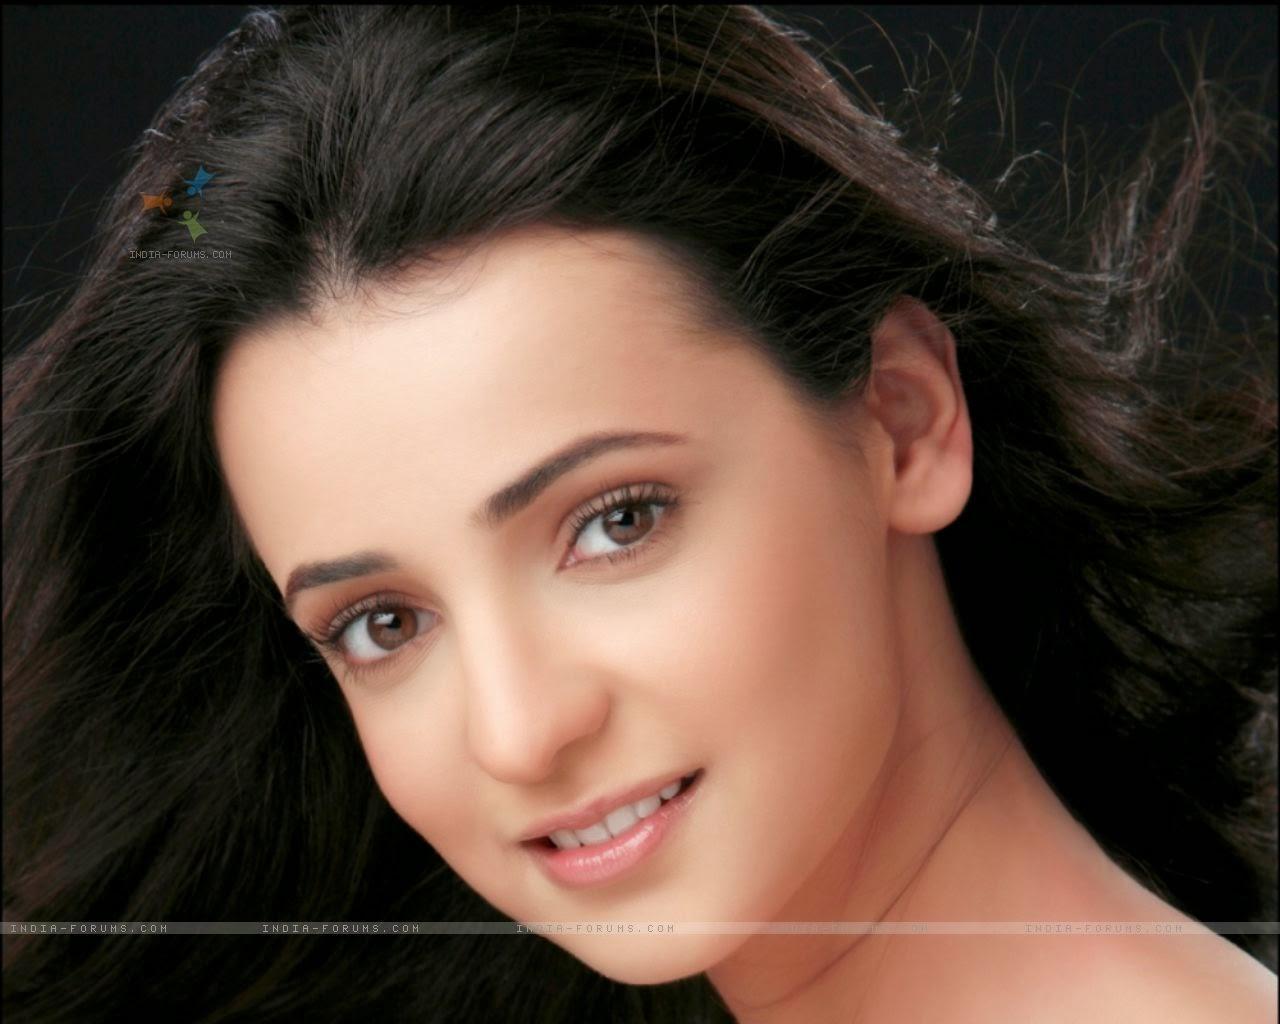 Indian Tv Serial Actress Sanaya Irani Hd Wallpapers,Gossip -9120